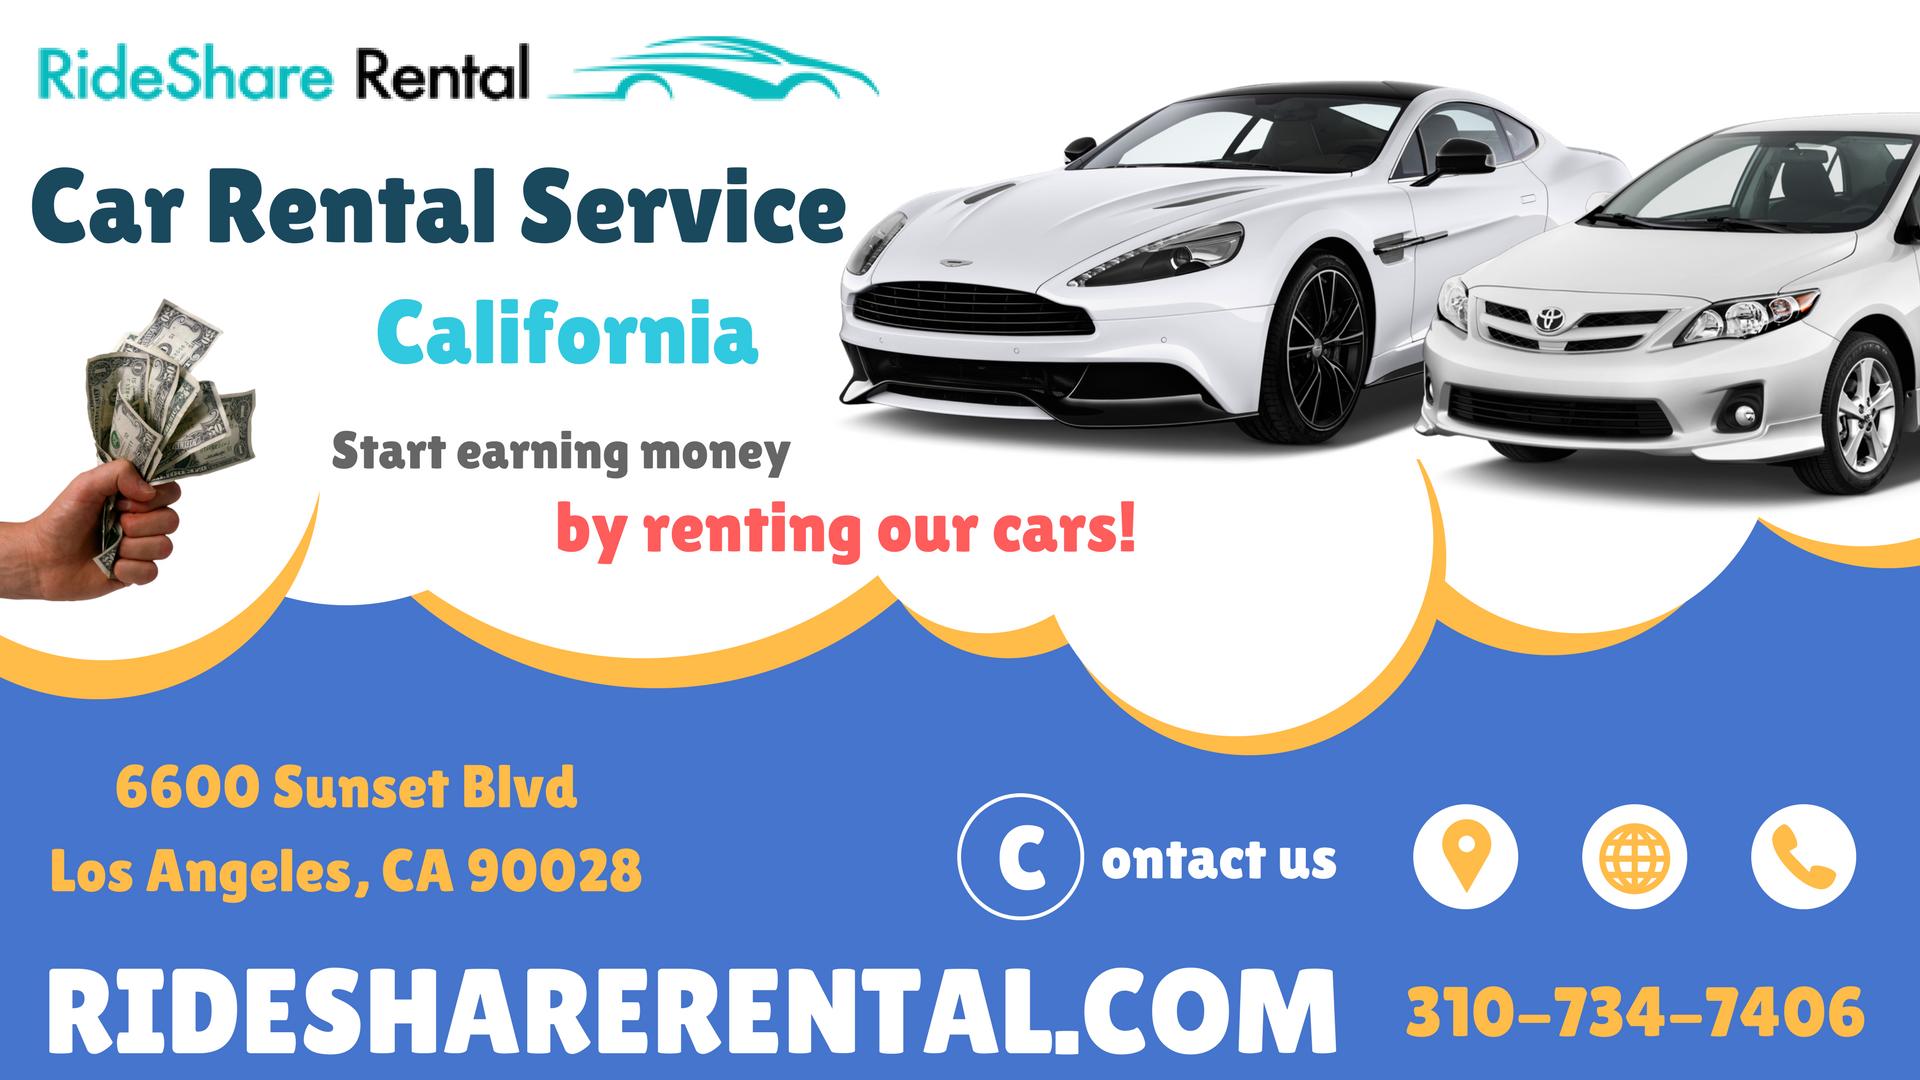 Car Rental Company In California Car Rental Service Car Rental Car Rental Company